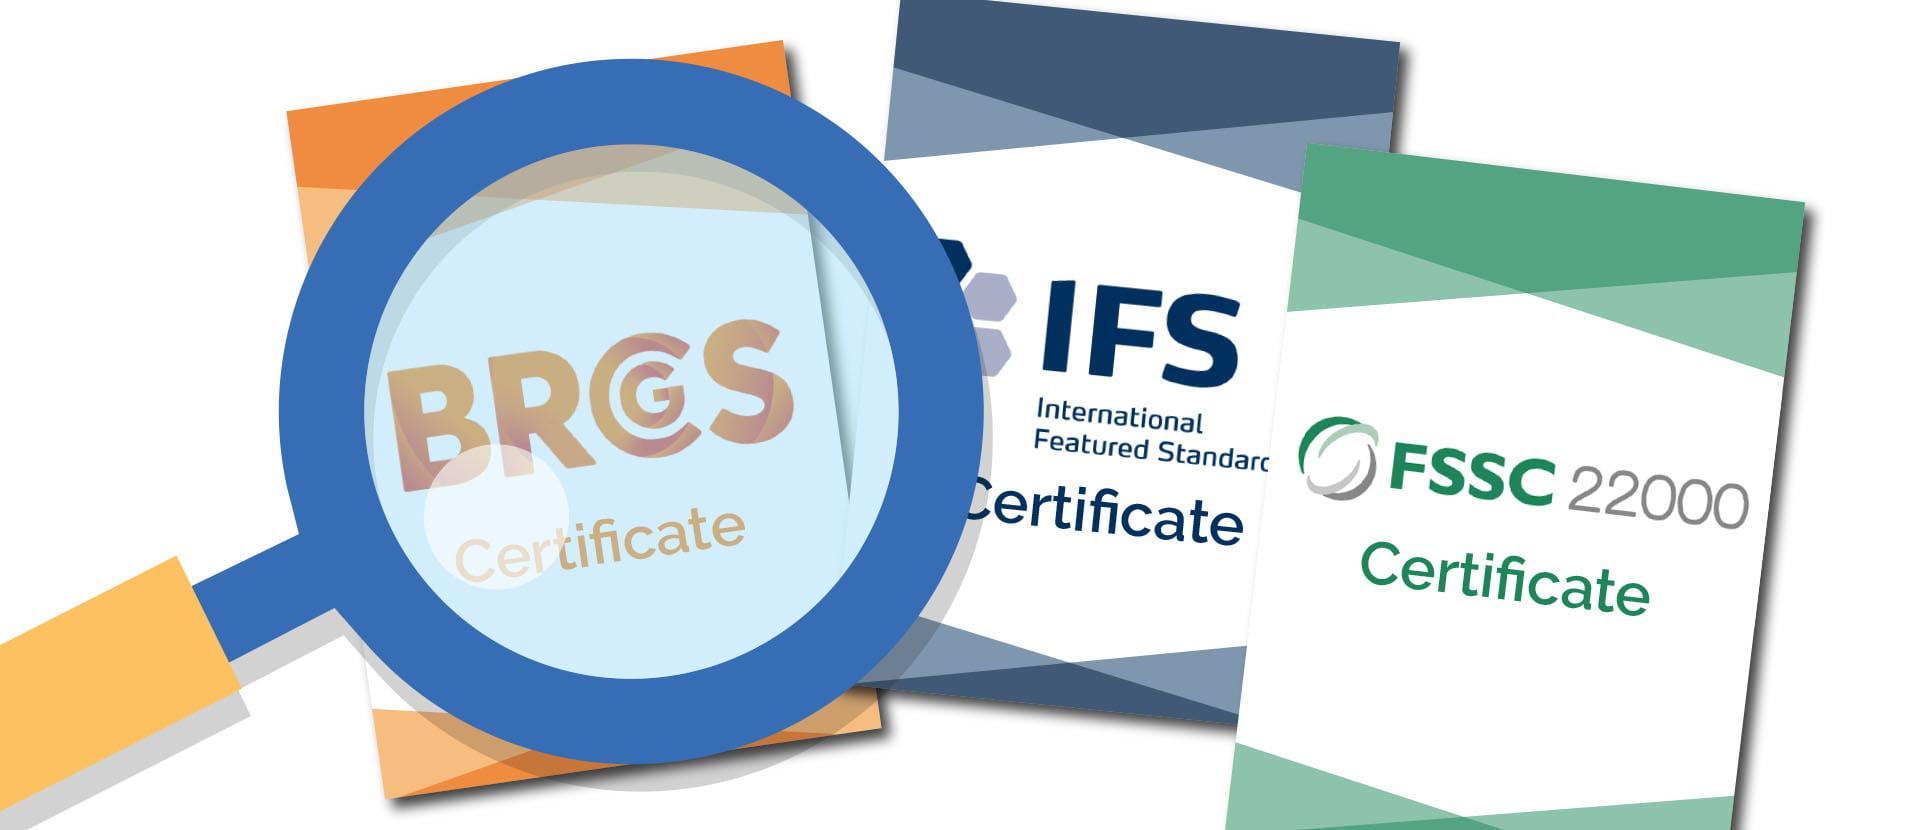 Comparison of BRCGS, IFS and FSSC certificate scores